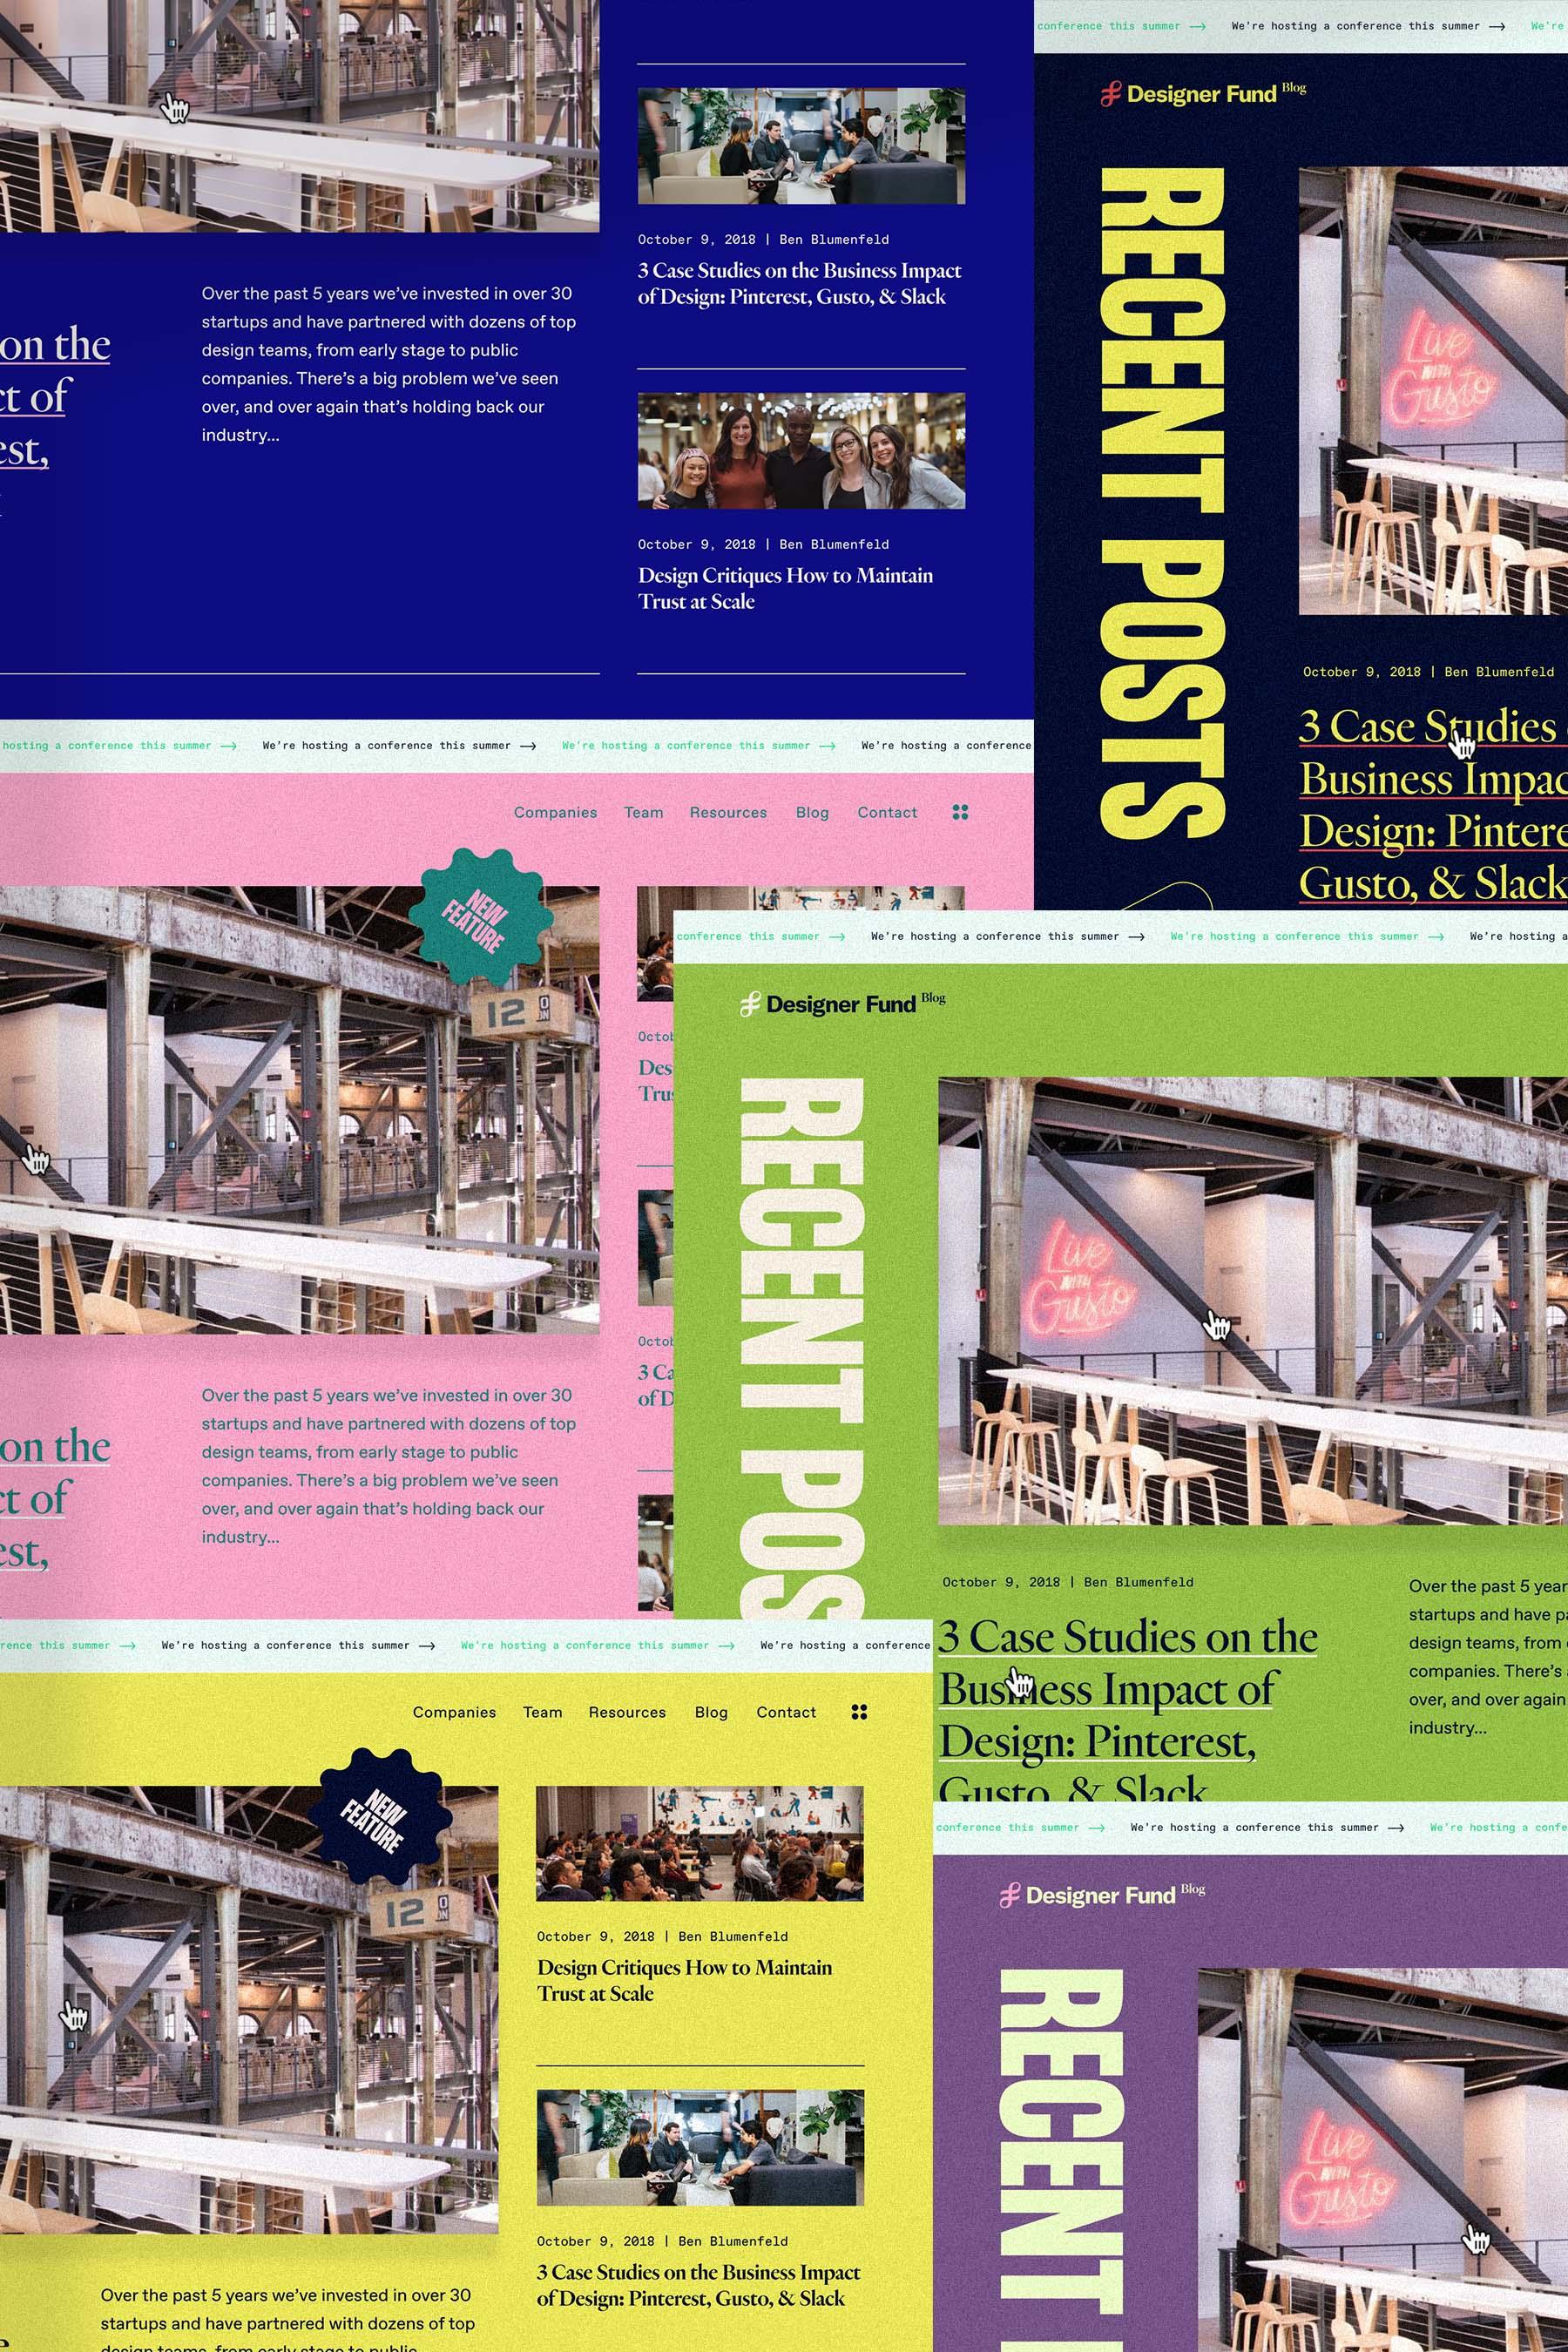 DF blog design.